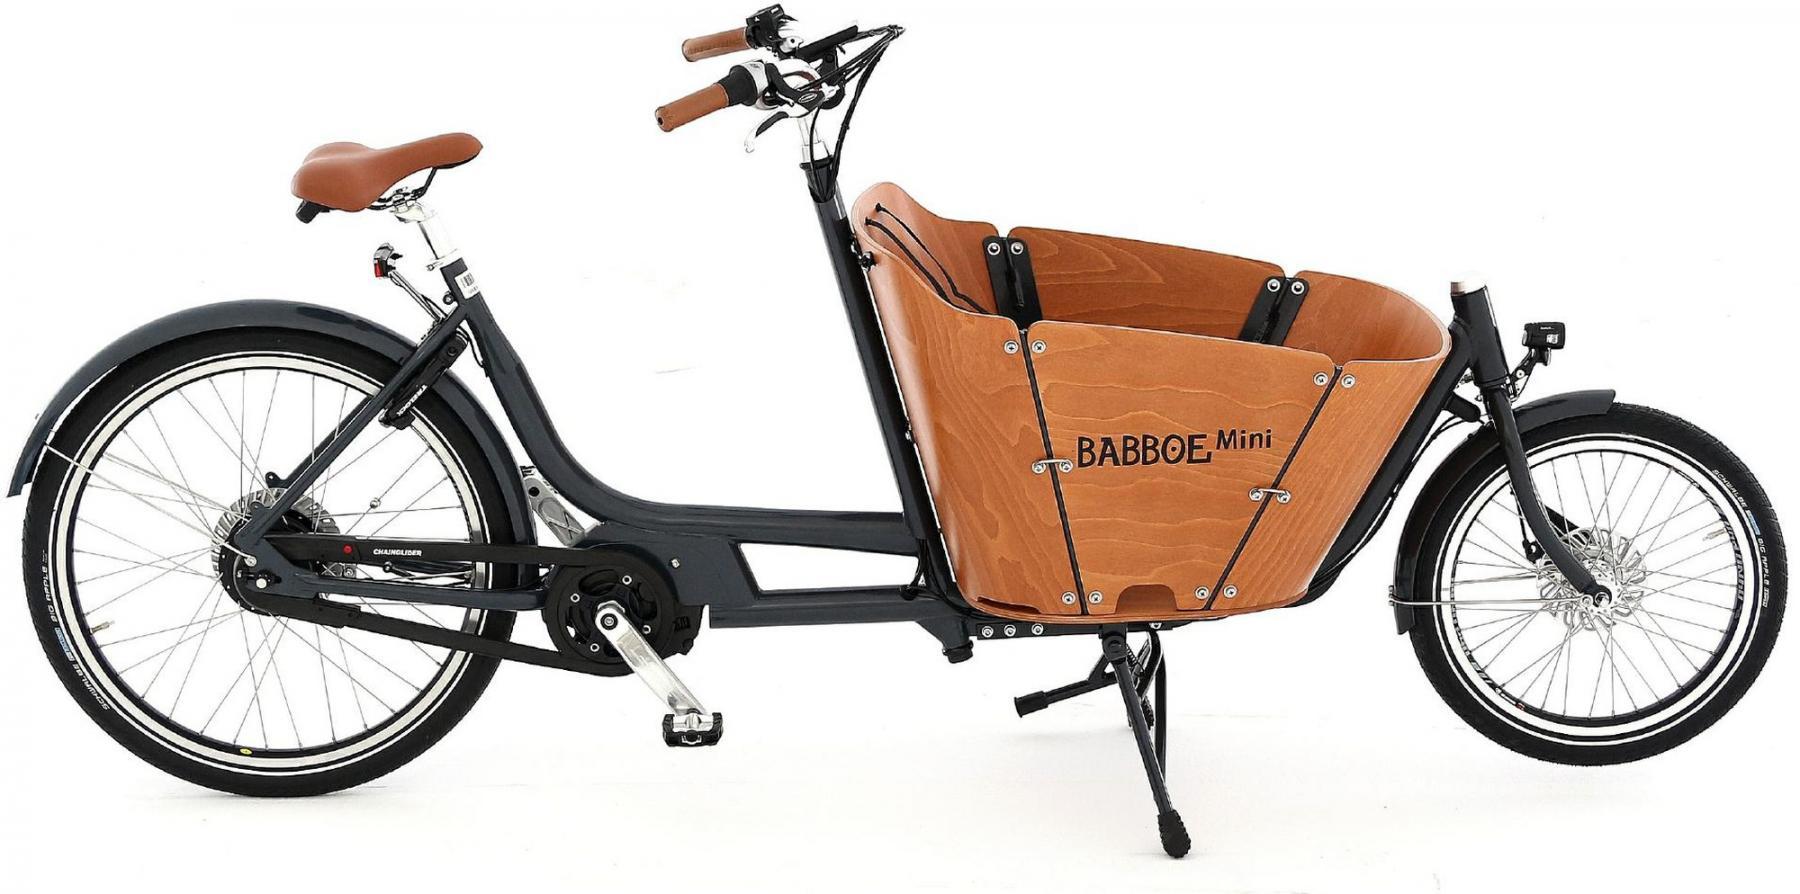 babboe mini mountain 2019 emotion technologies. Black Bedroom Furniture Sets. Home Design Ideas